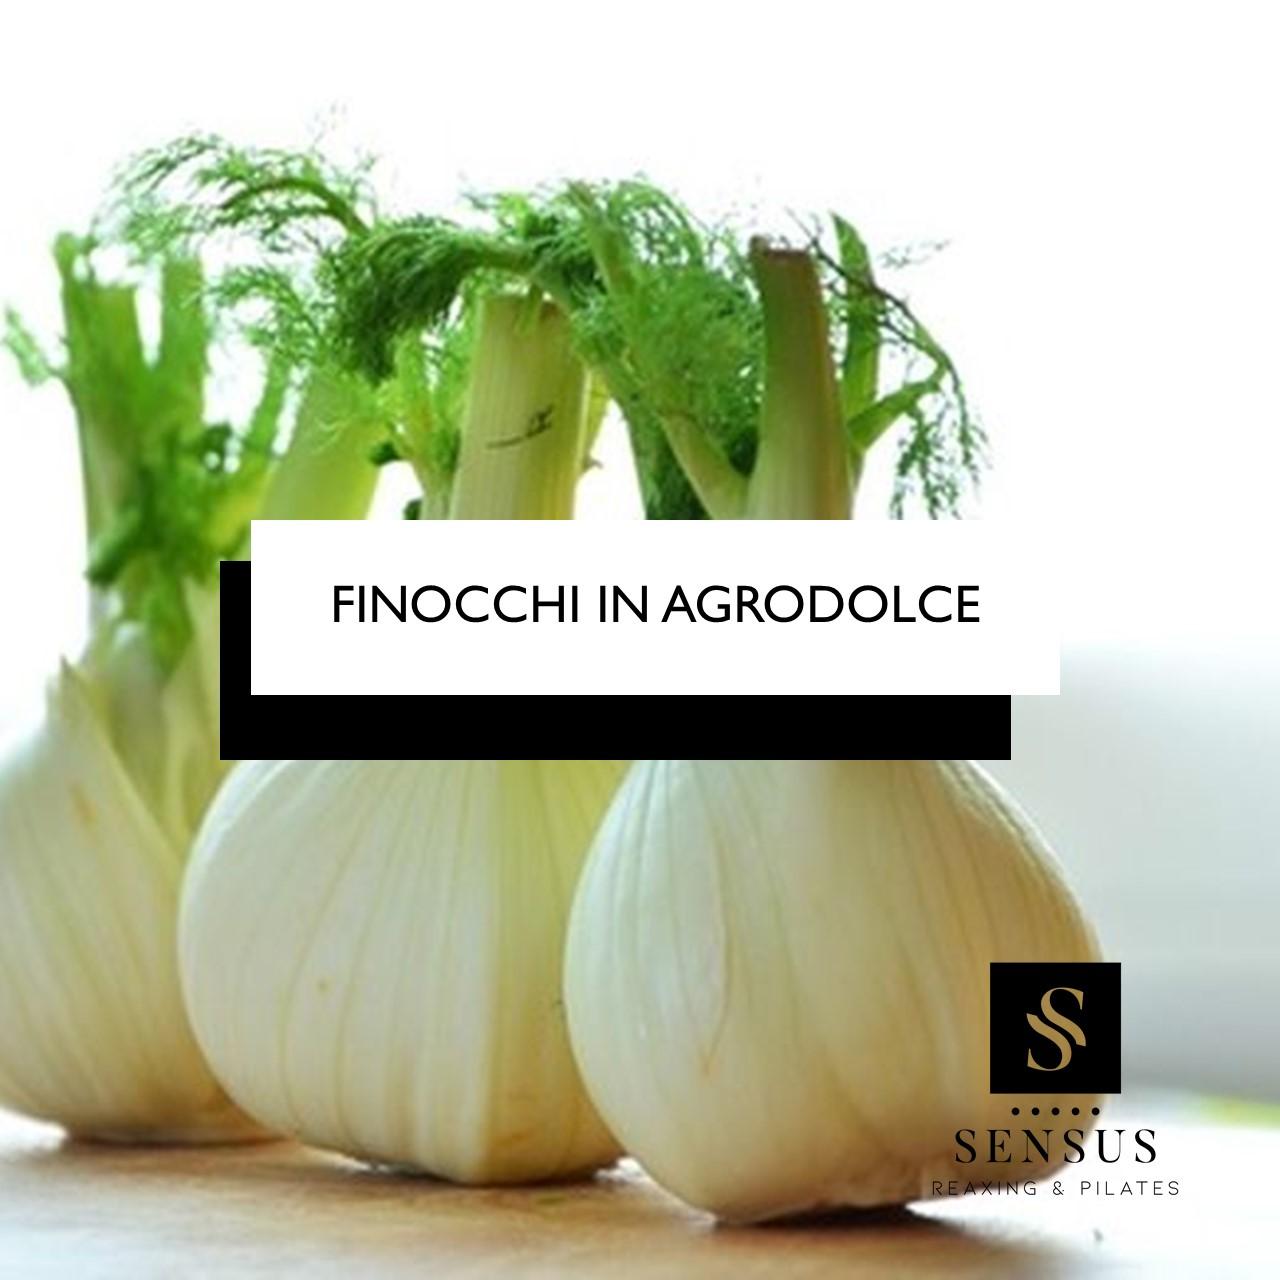 FINOCCHI IN AGRODOLCE